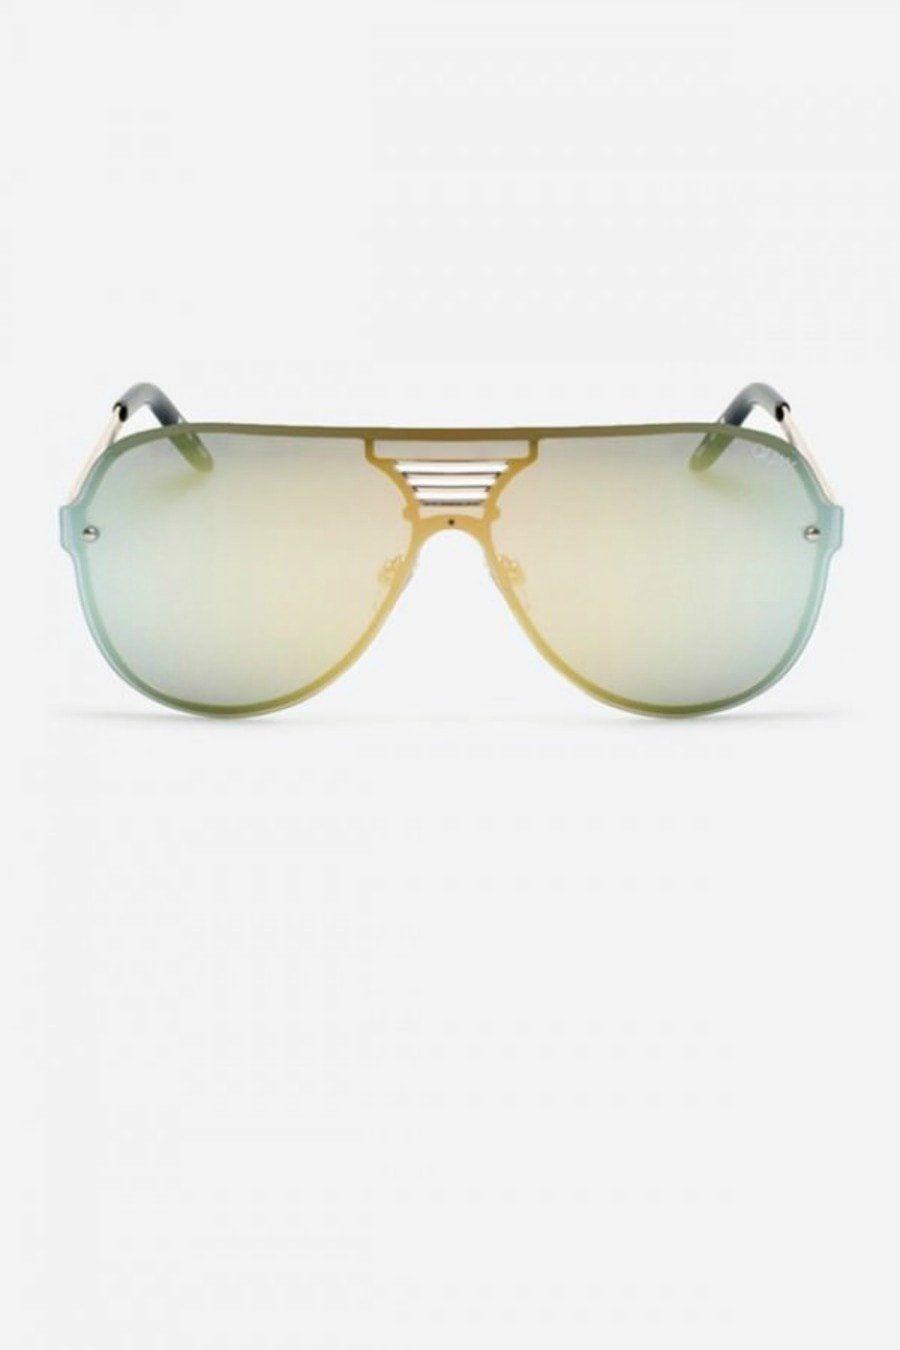 Quay australia showtime gold mirror designer sunglasses